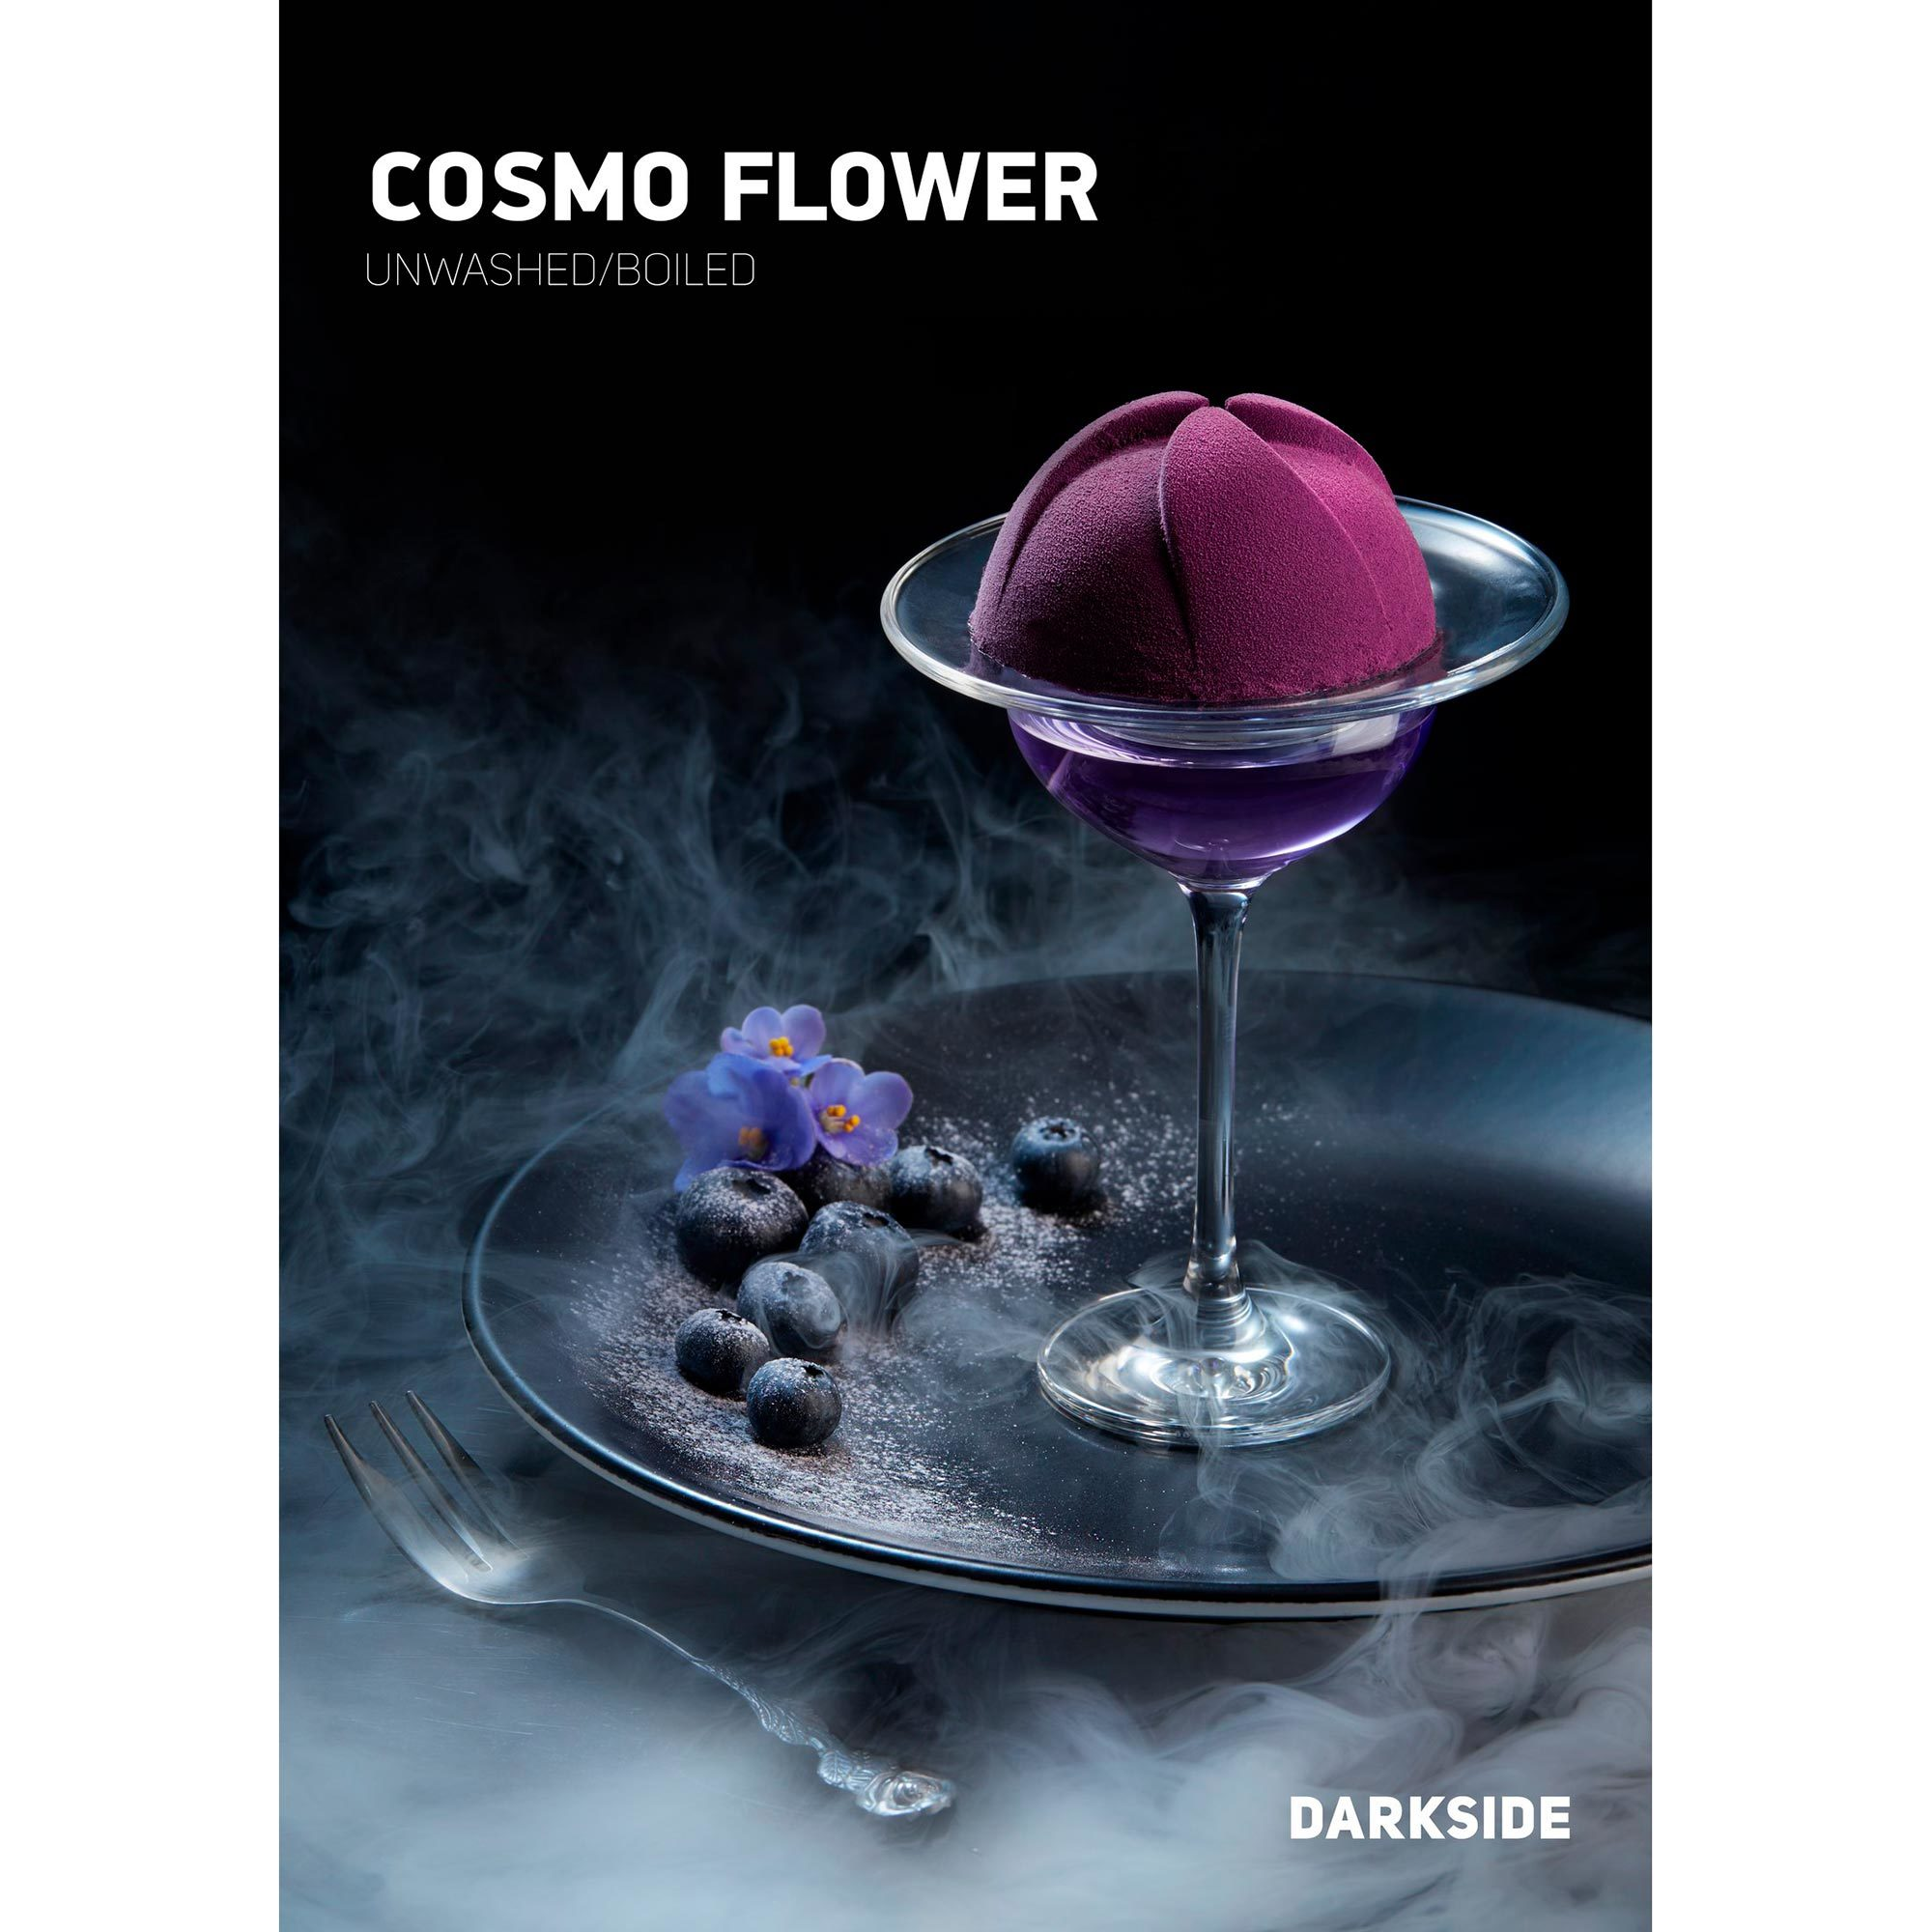 Табак для кальяна Dark Side Core 100 гр Cosmo Flower, магазин FOHM